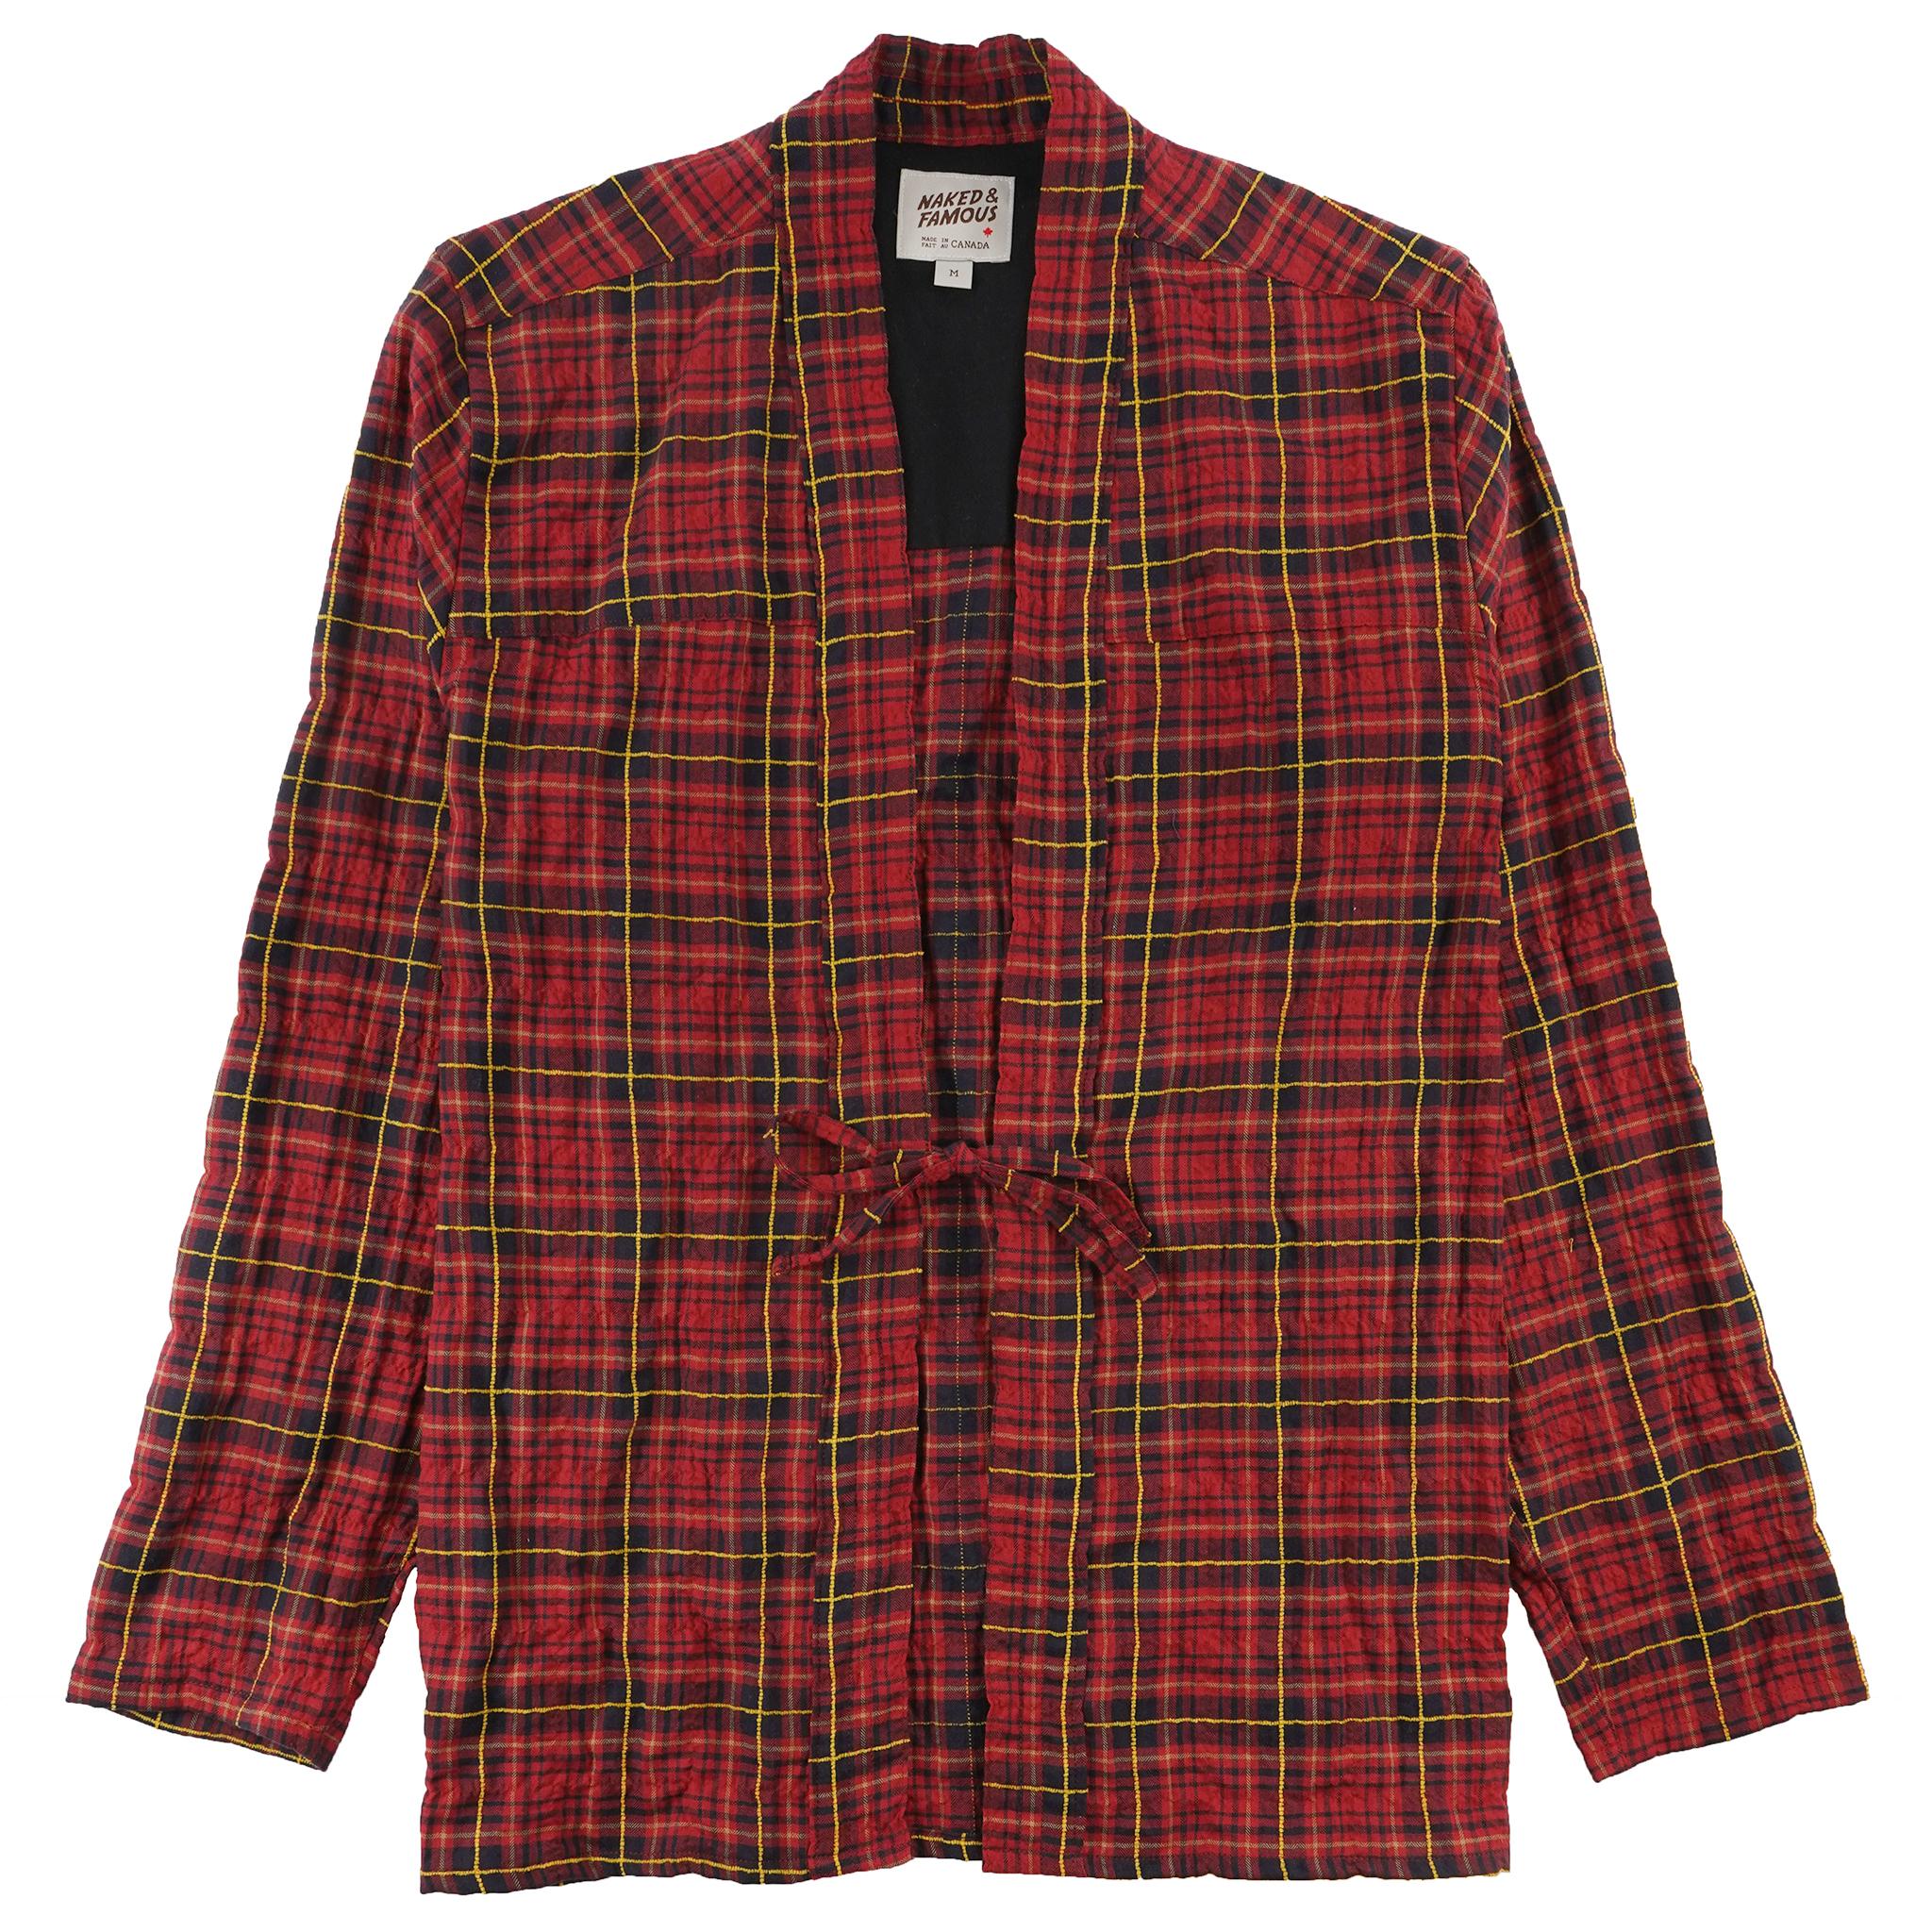 Folk Flannel - Red/Yellow - Kimono Shirt